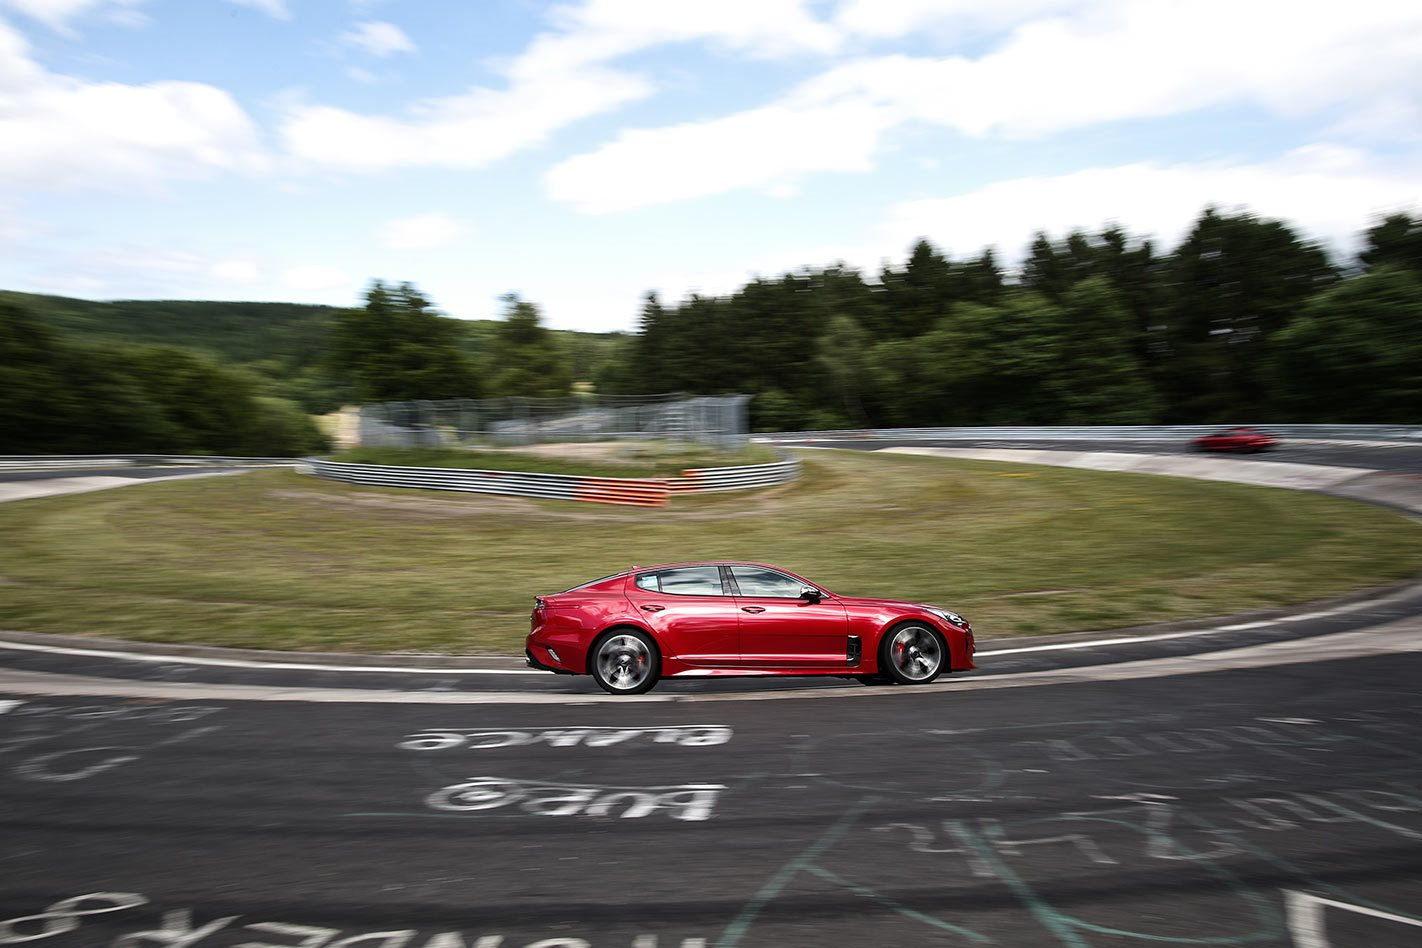 2017 Kia Stinger GT race track